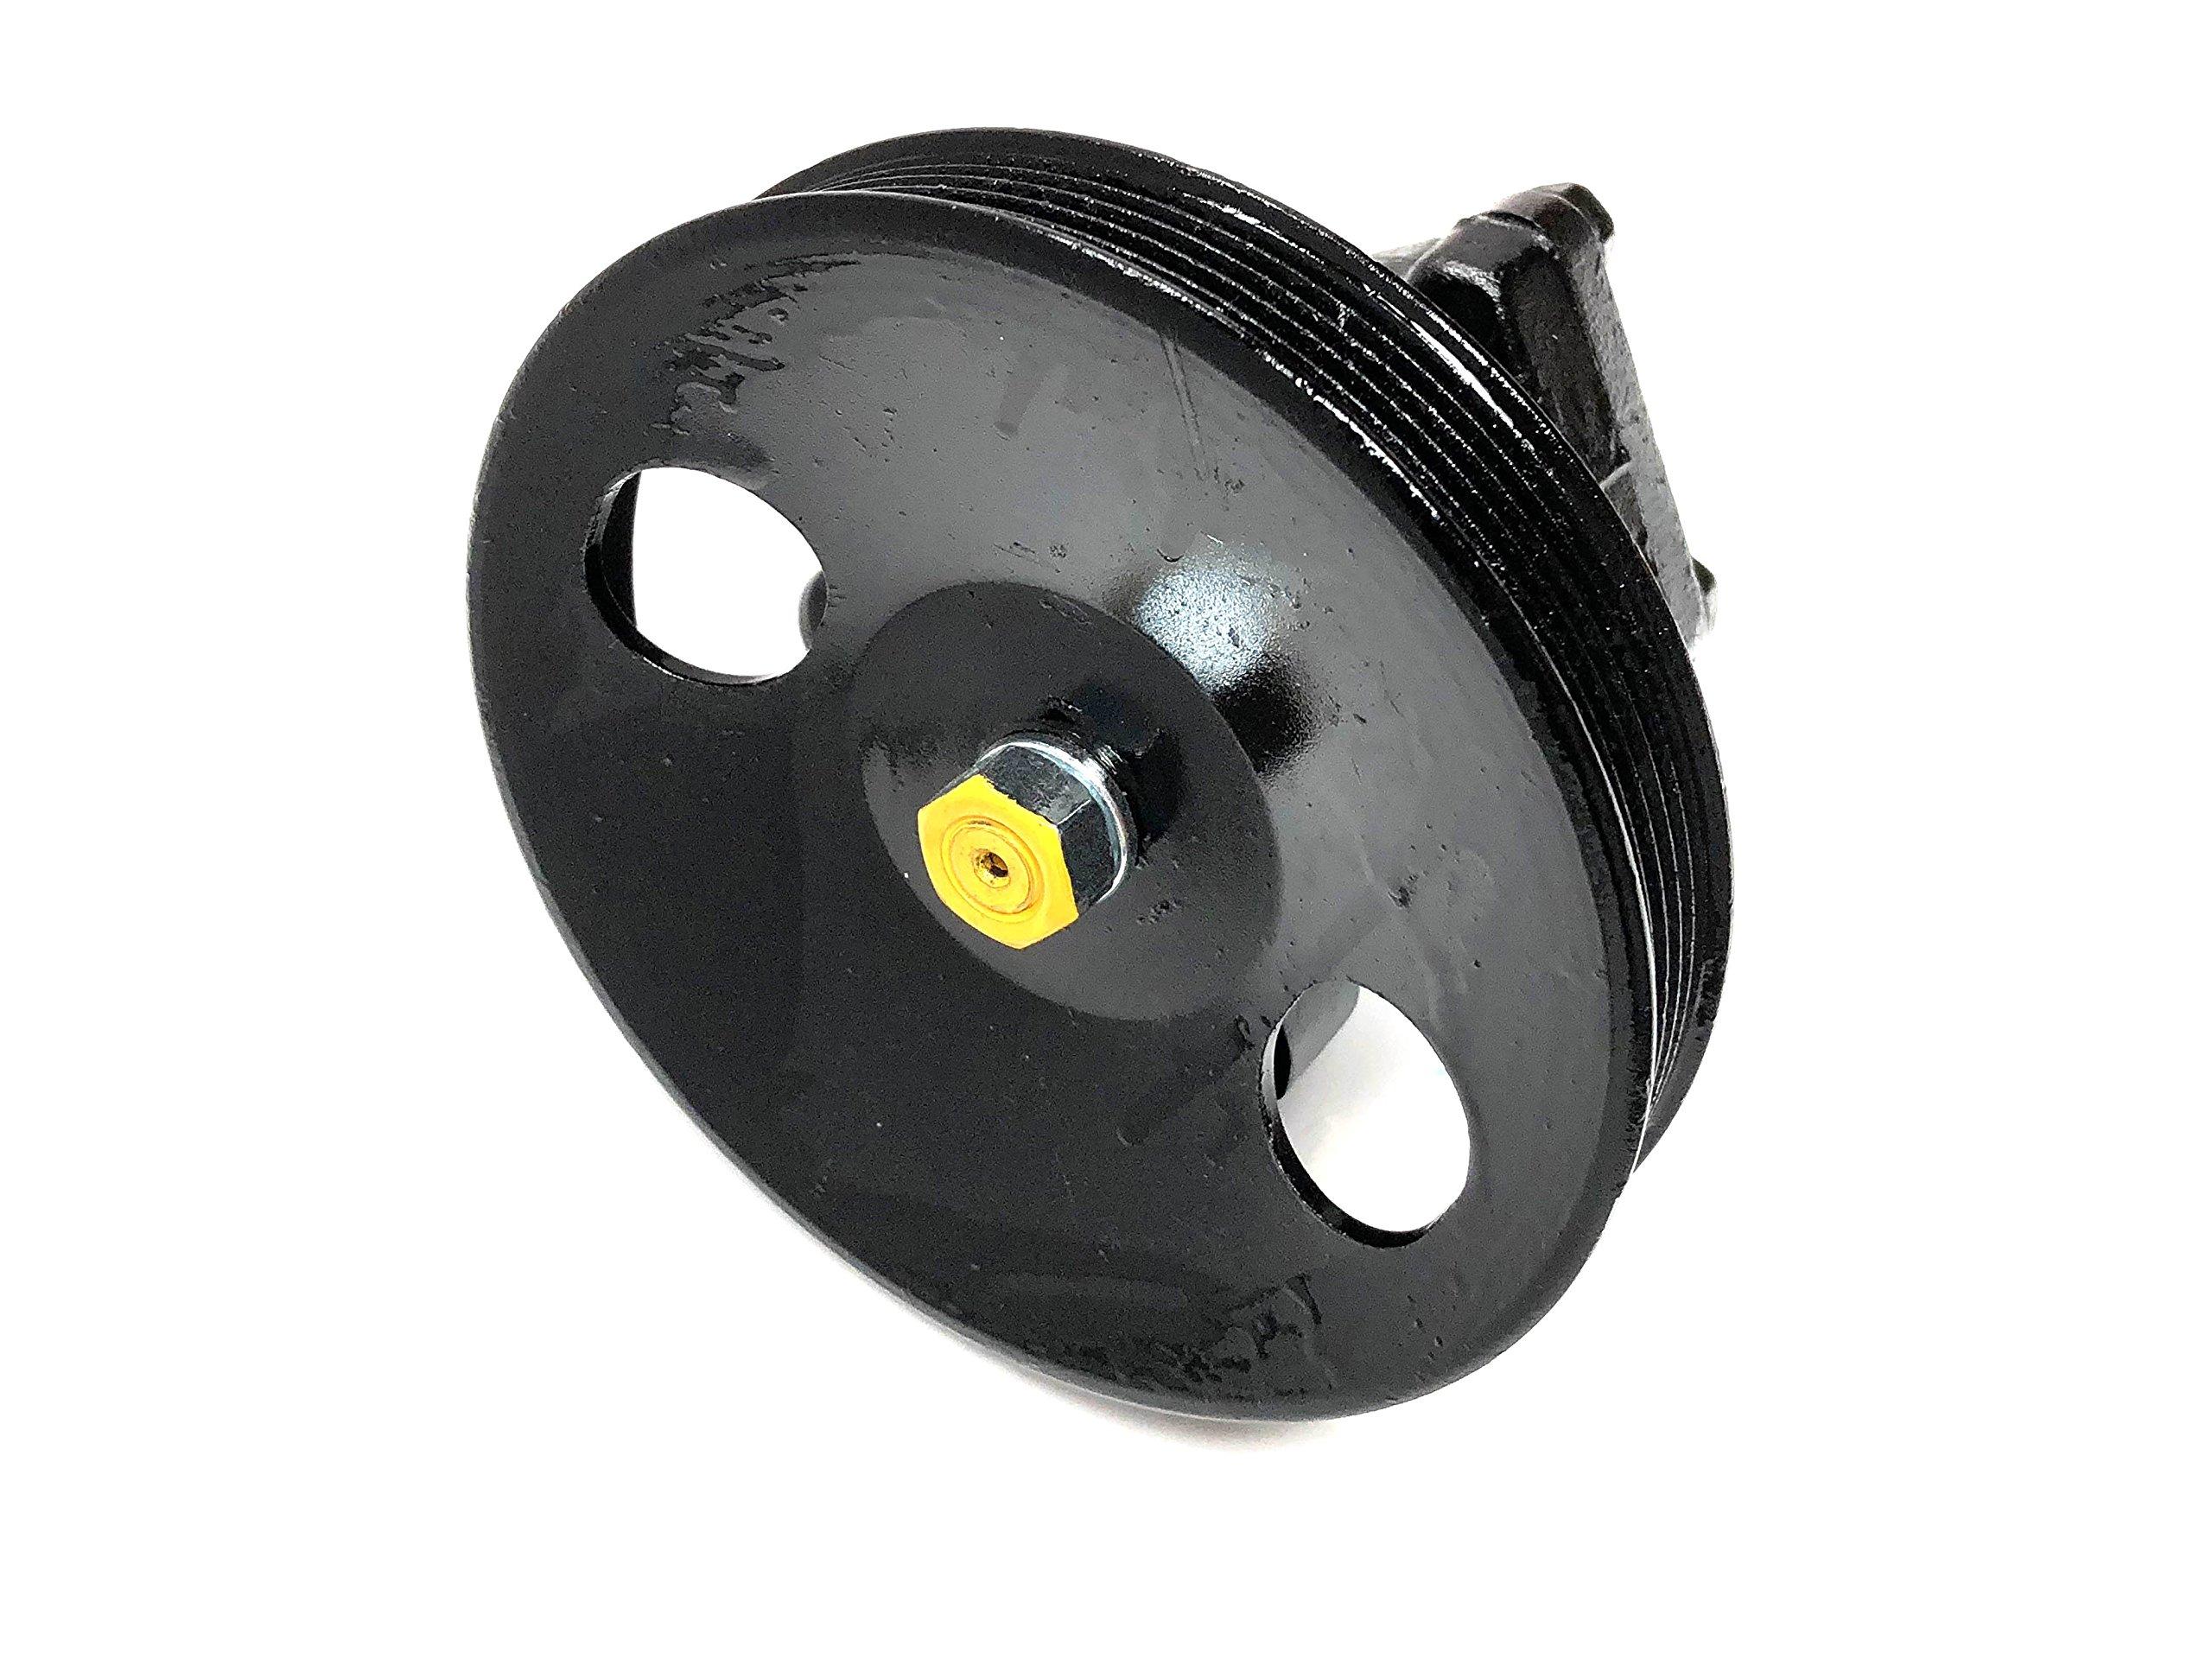 Power Steering Pump for 2000-2003 HYUNDAI ELANTRA